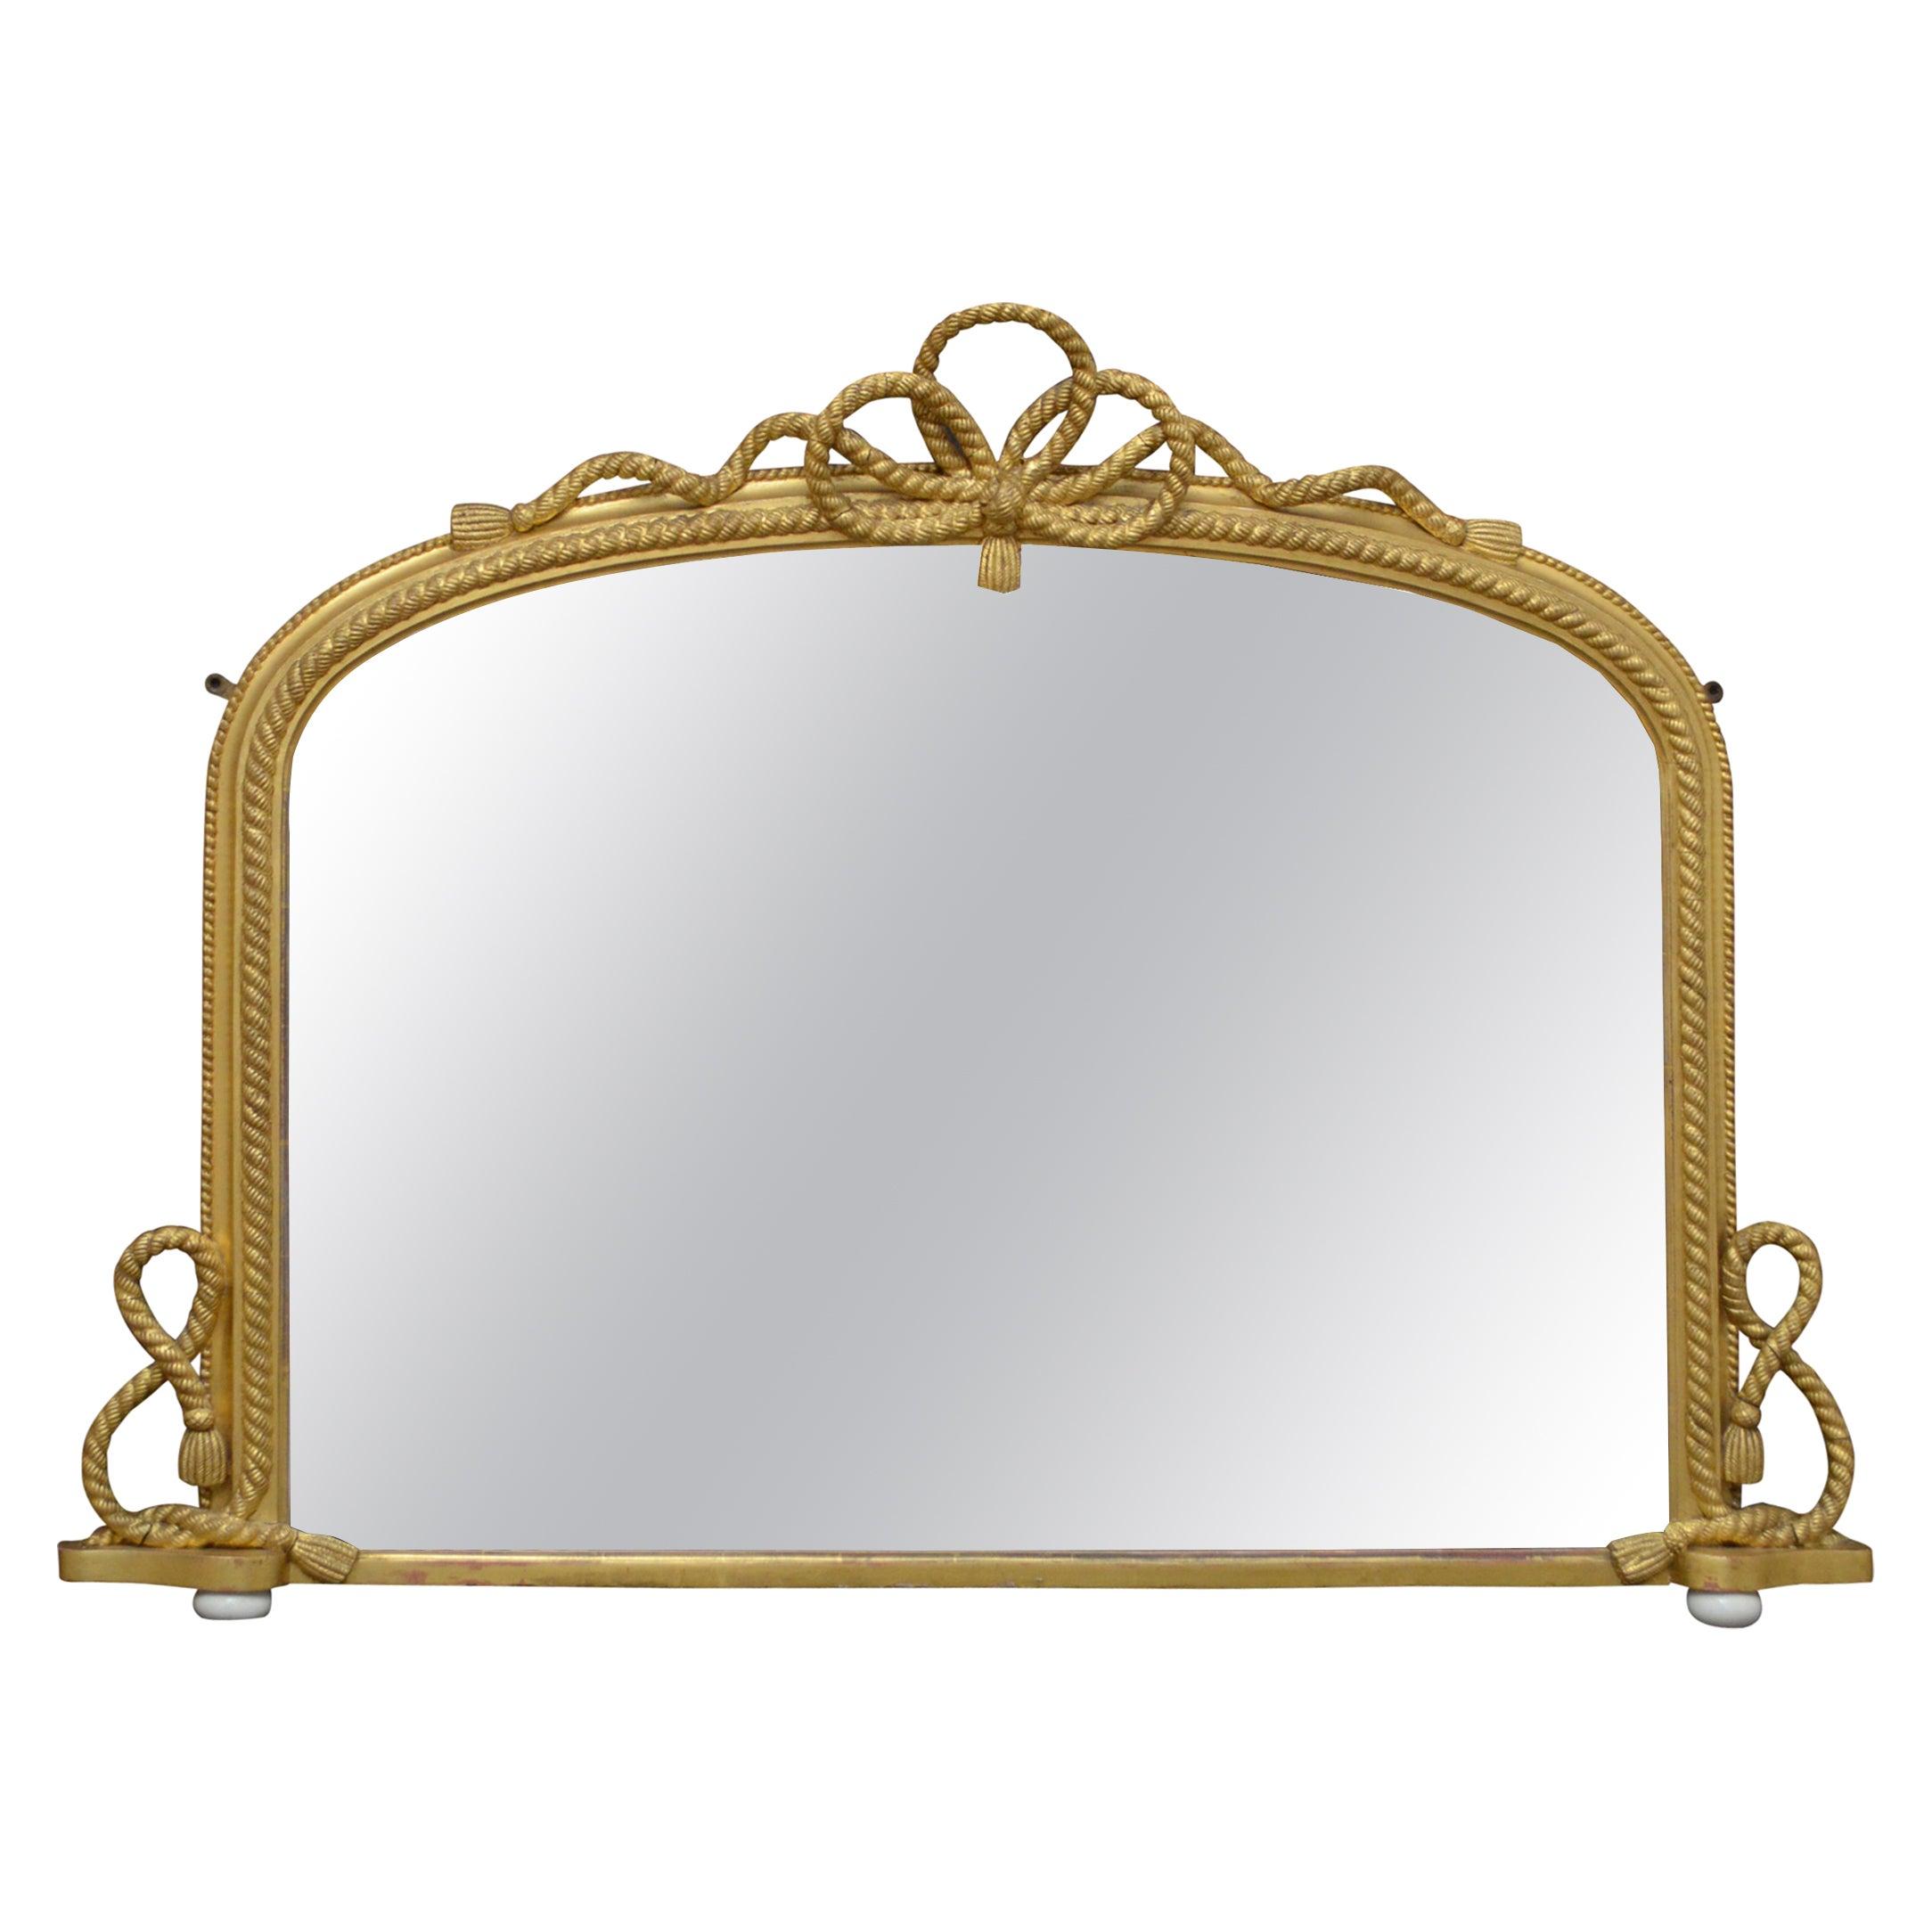 Victorian Giltwood Overmantel Mirror